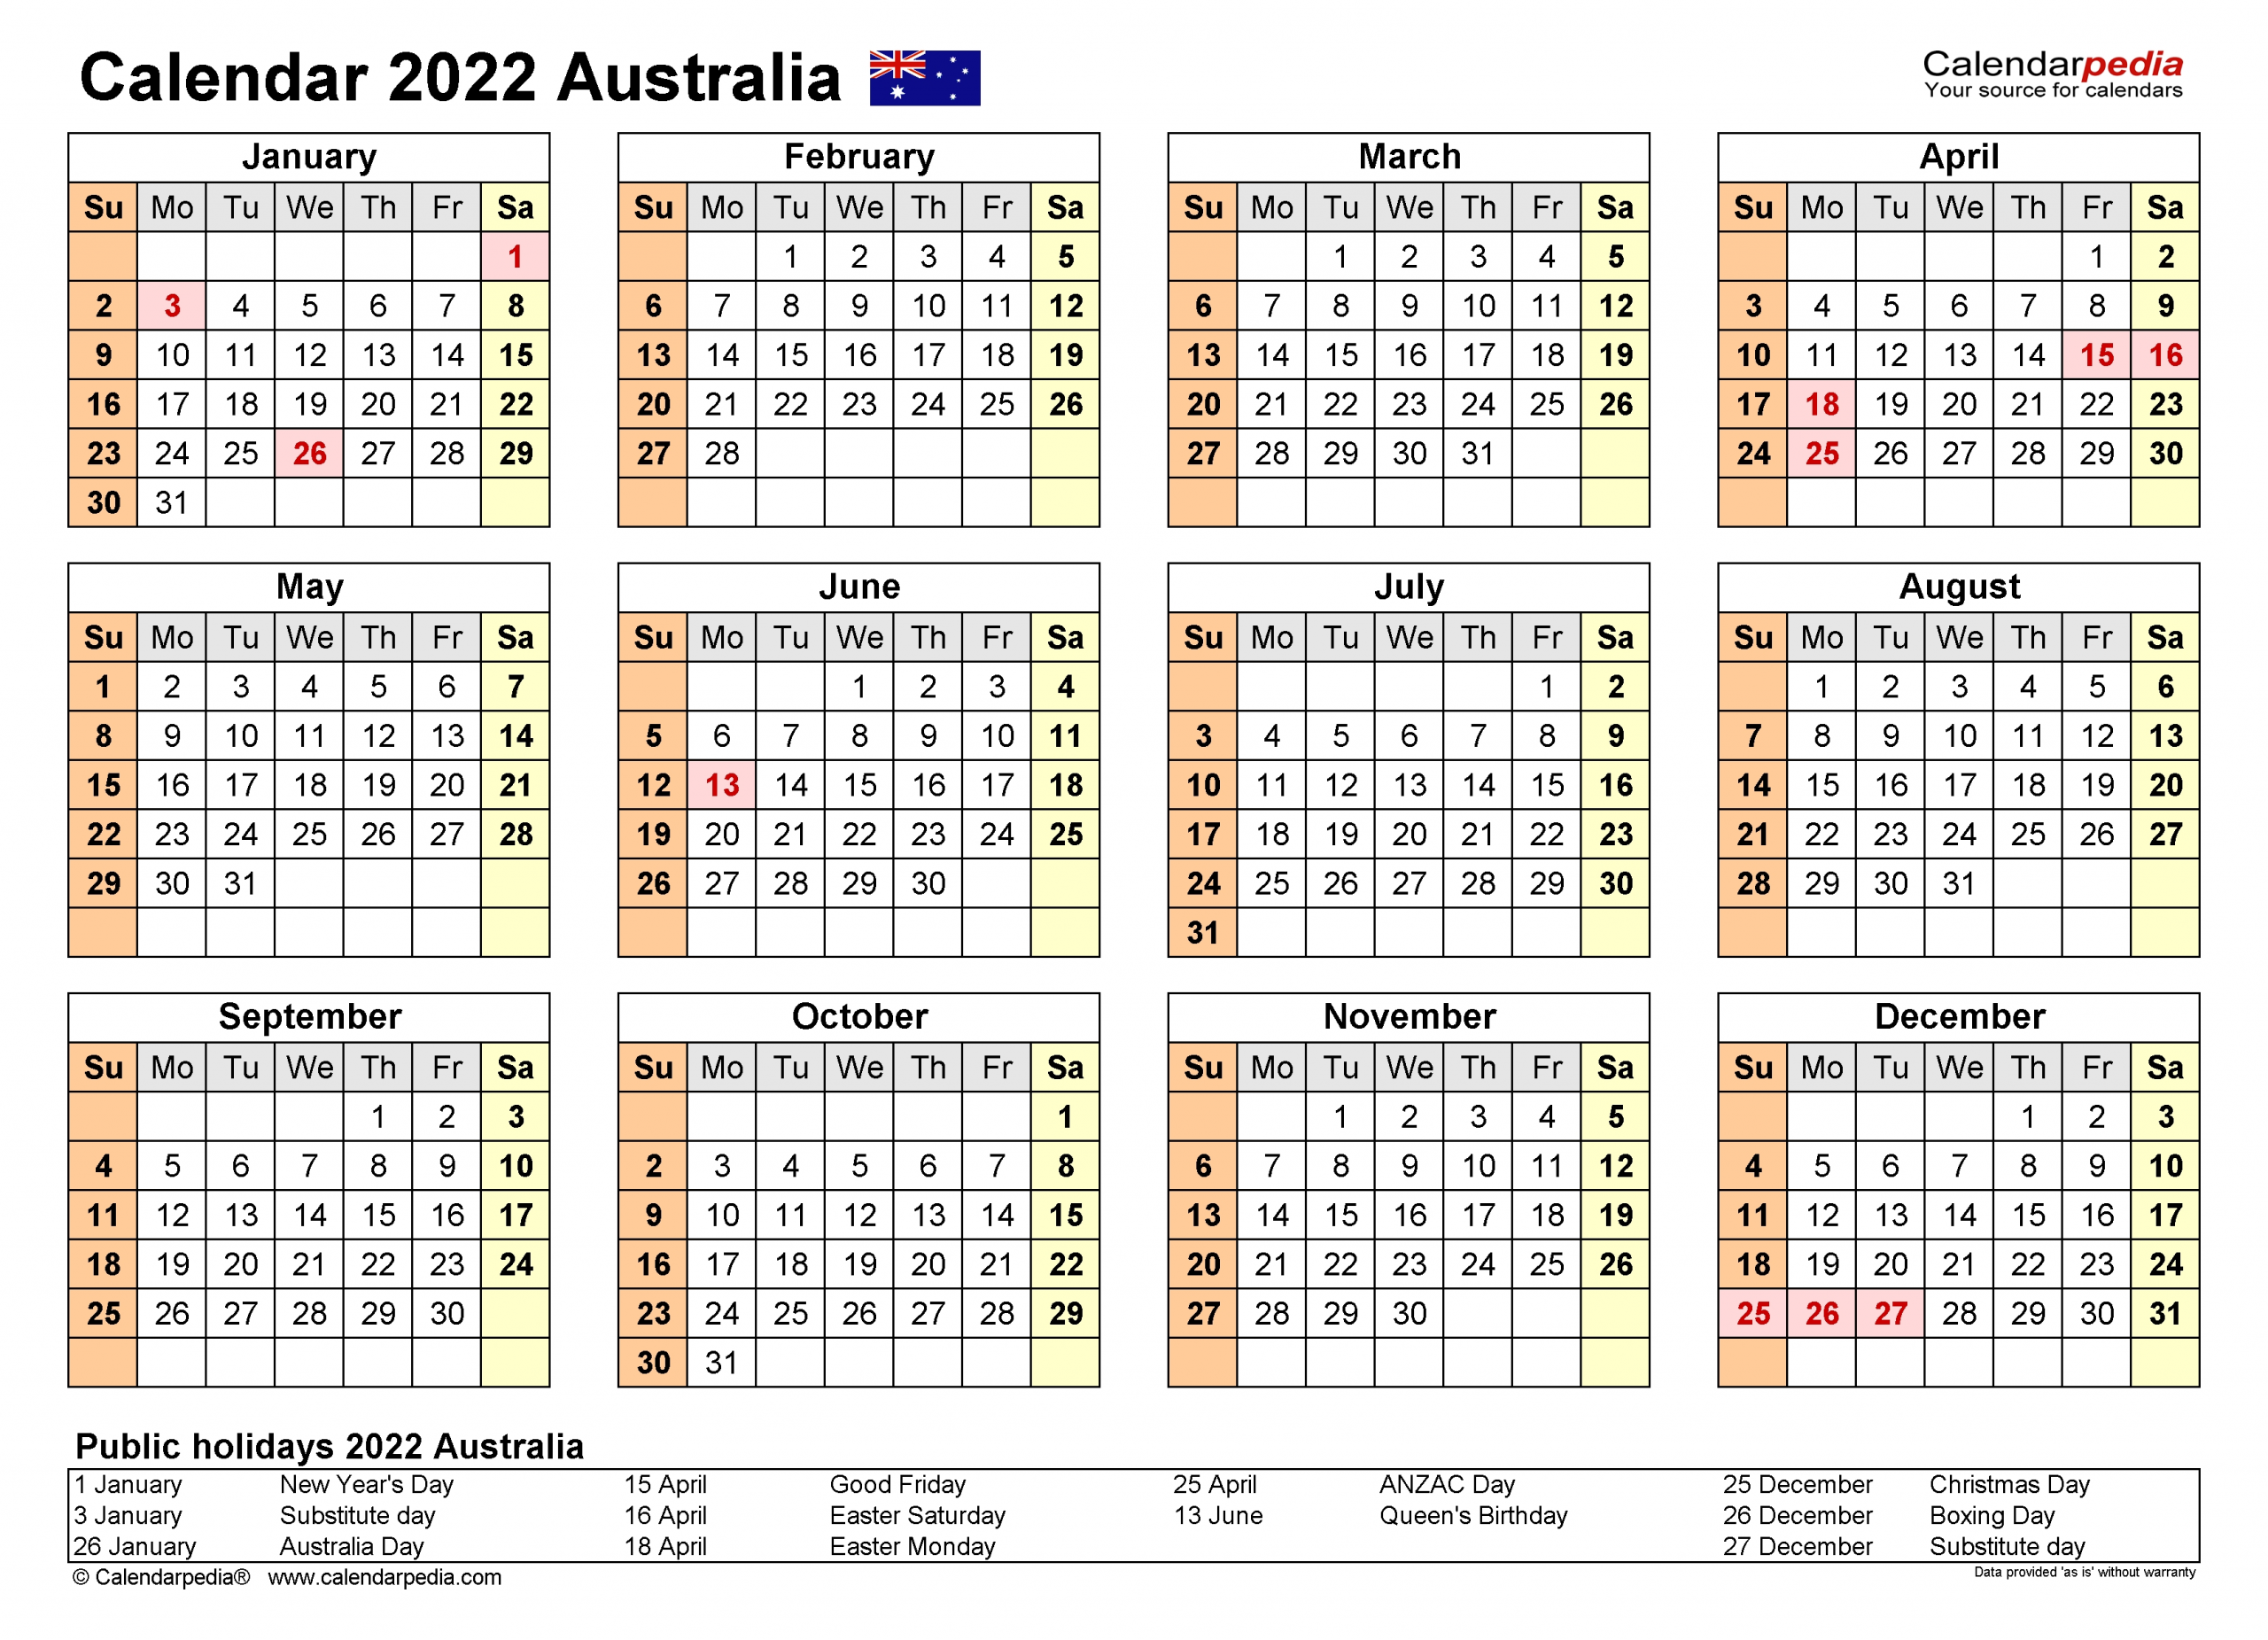 Australia Calendar 2022 - Free Printable Pdf Templates  Australia What Are The Dates For The 18/19 Financial Year